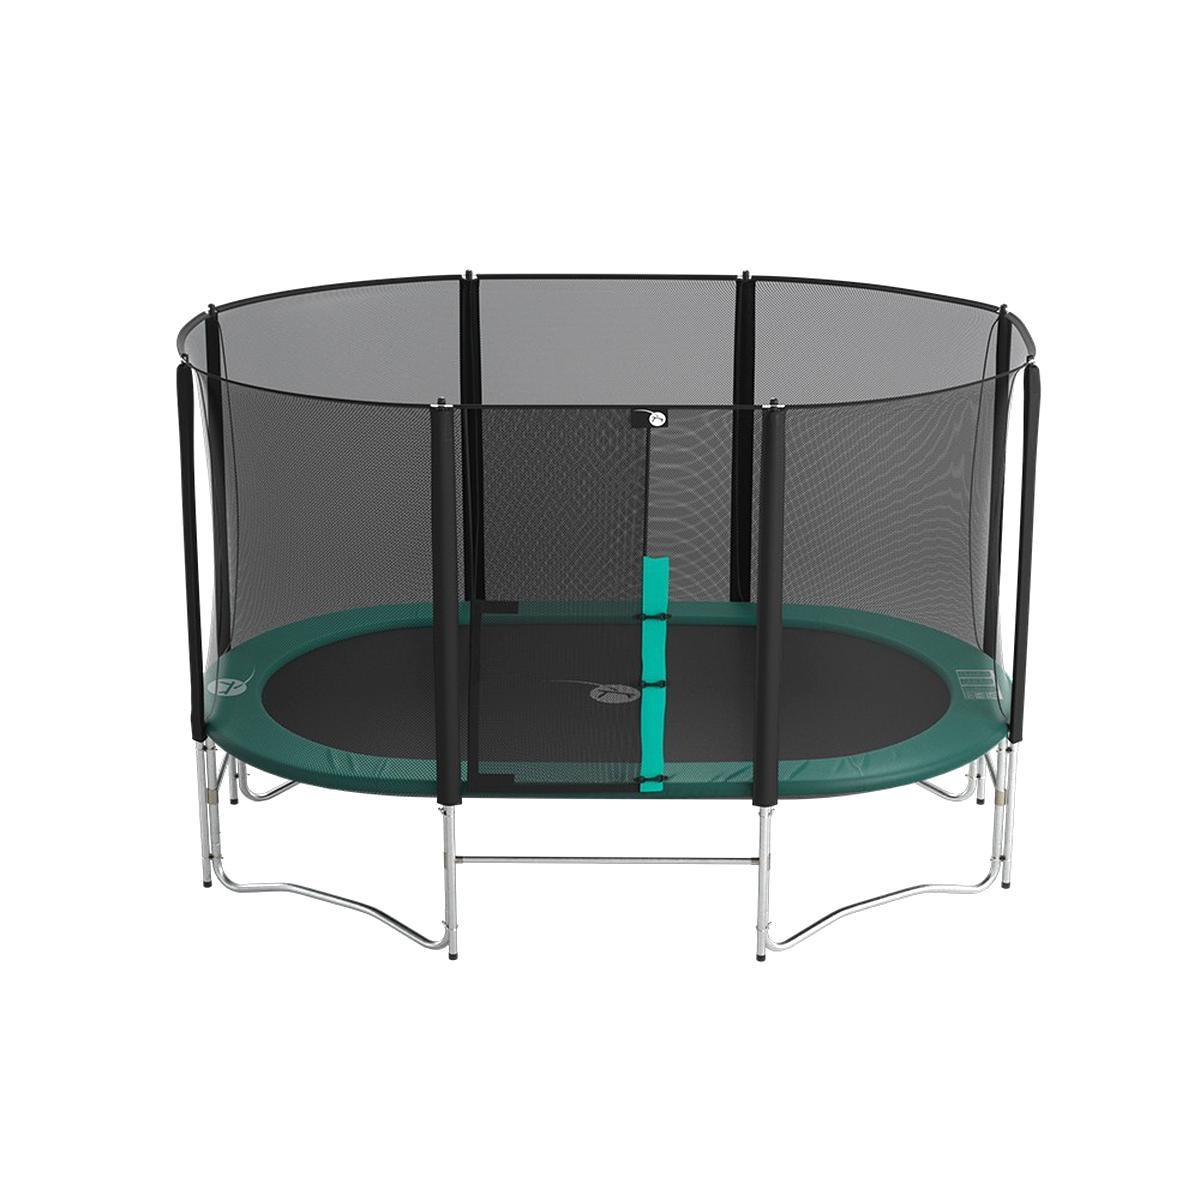 filet trampoline d'occasion